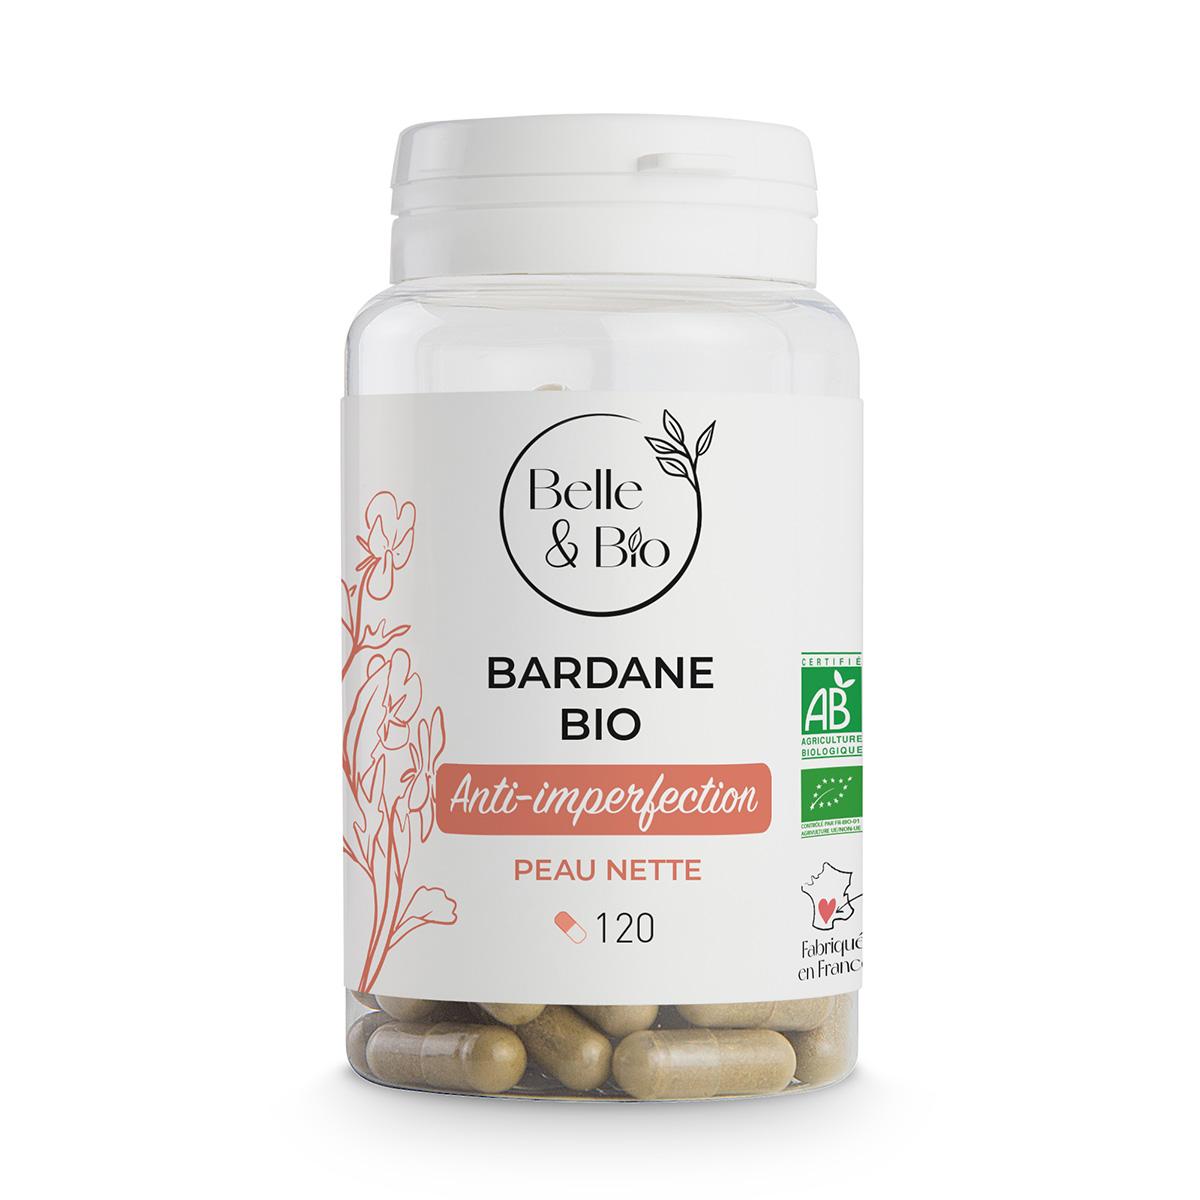 Belle & Bio - Bardane Bio - Beaute - 120 Gelules - Certifie AB par Ecocert